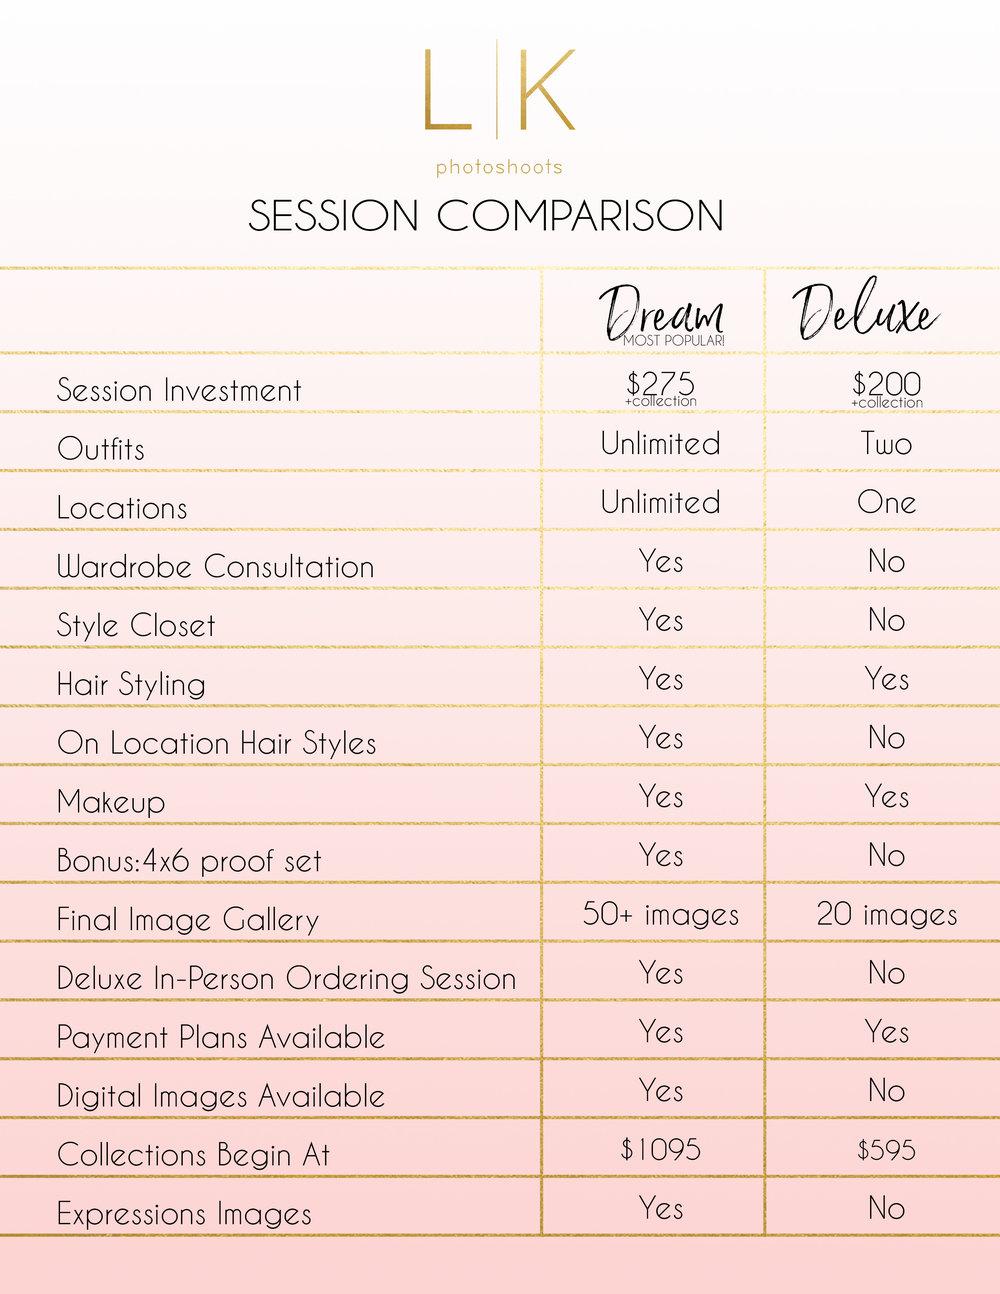 Session Comparison 2020.jpg